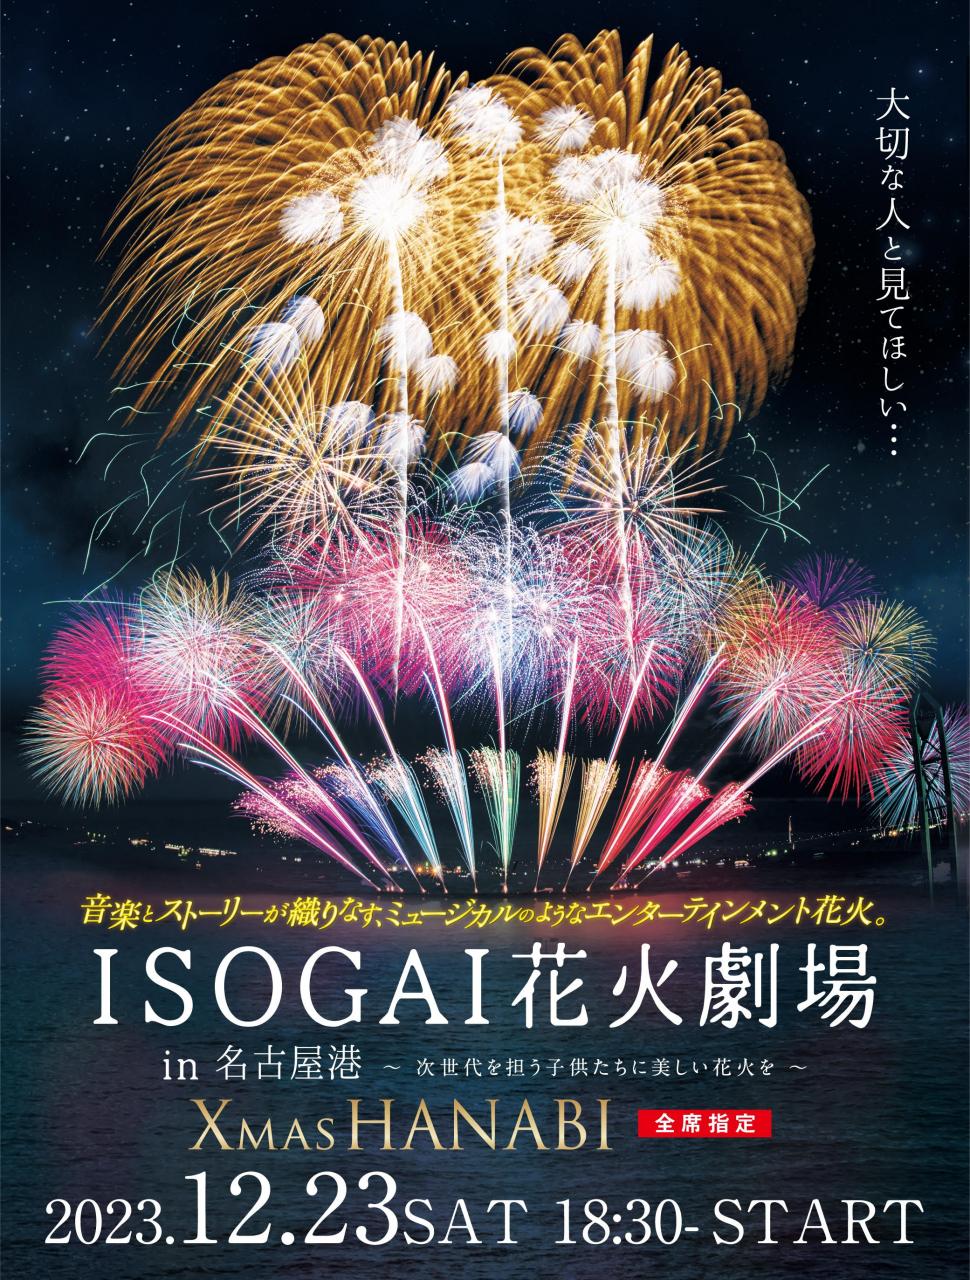 ISOGAI花火劇場in名古屋港~次世代を担う子供たちに美しい花火を~